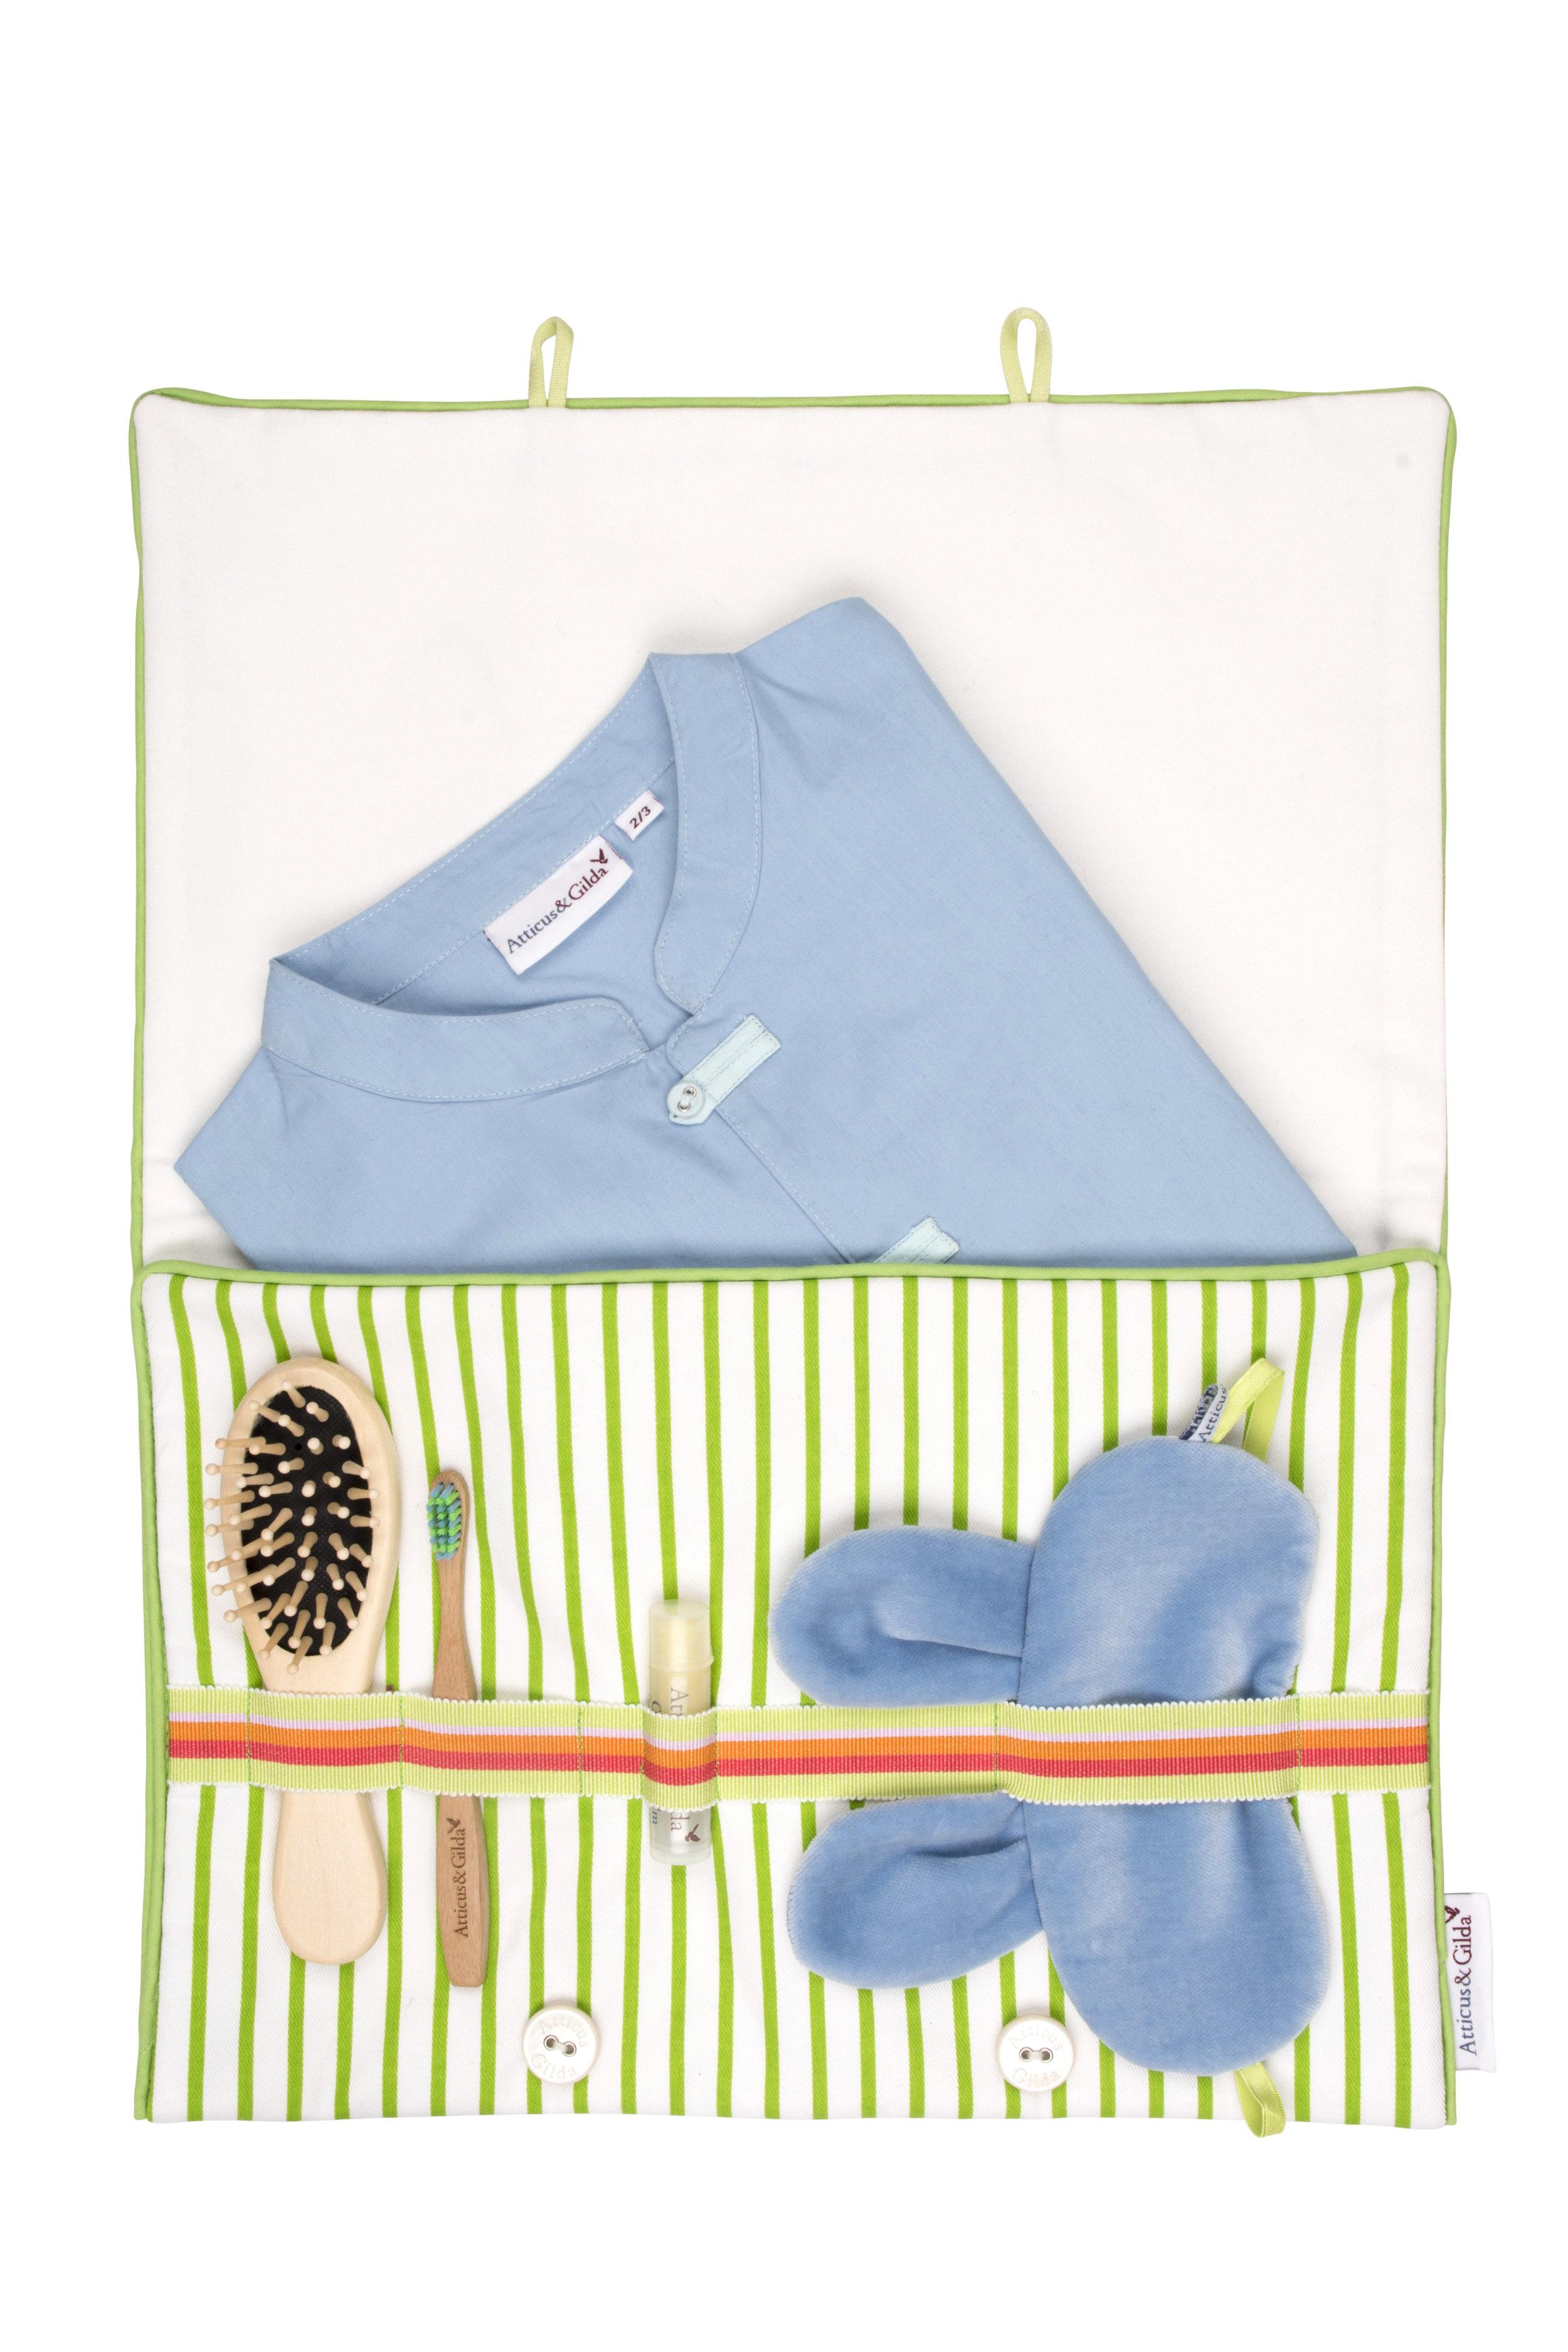 Atticus and Gilda pyjama overnight bag with brush, pyjamas, toothbrush, lip balm and sleep mask